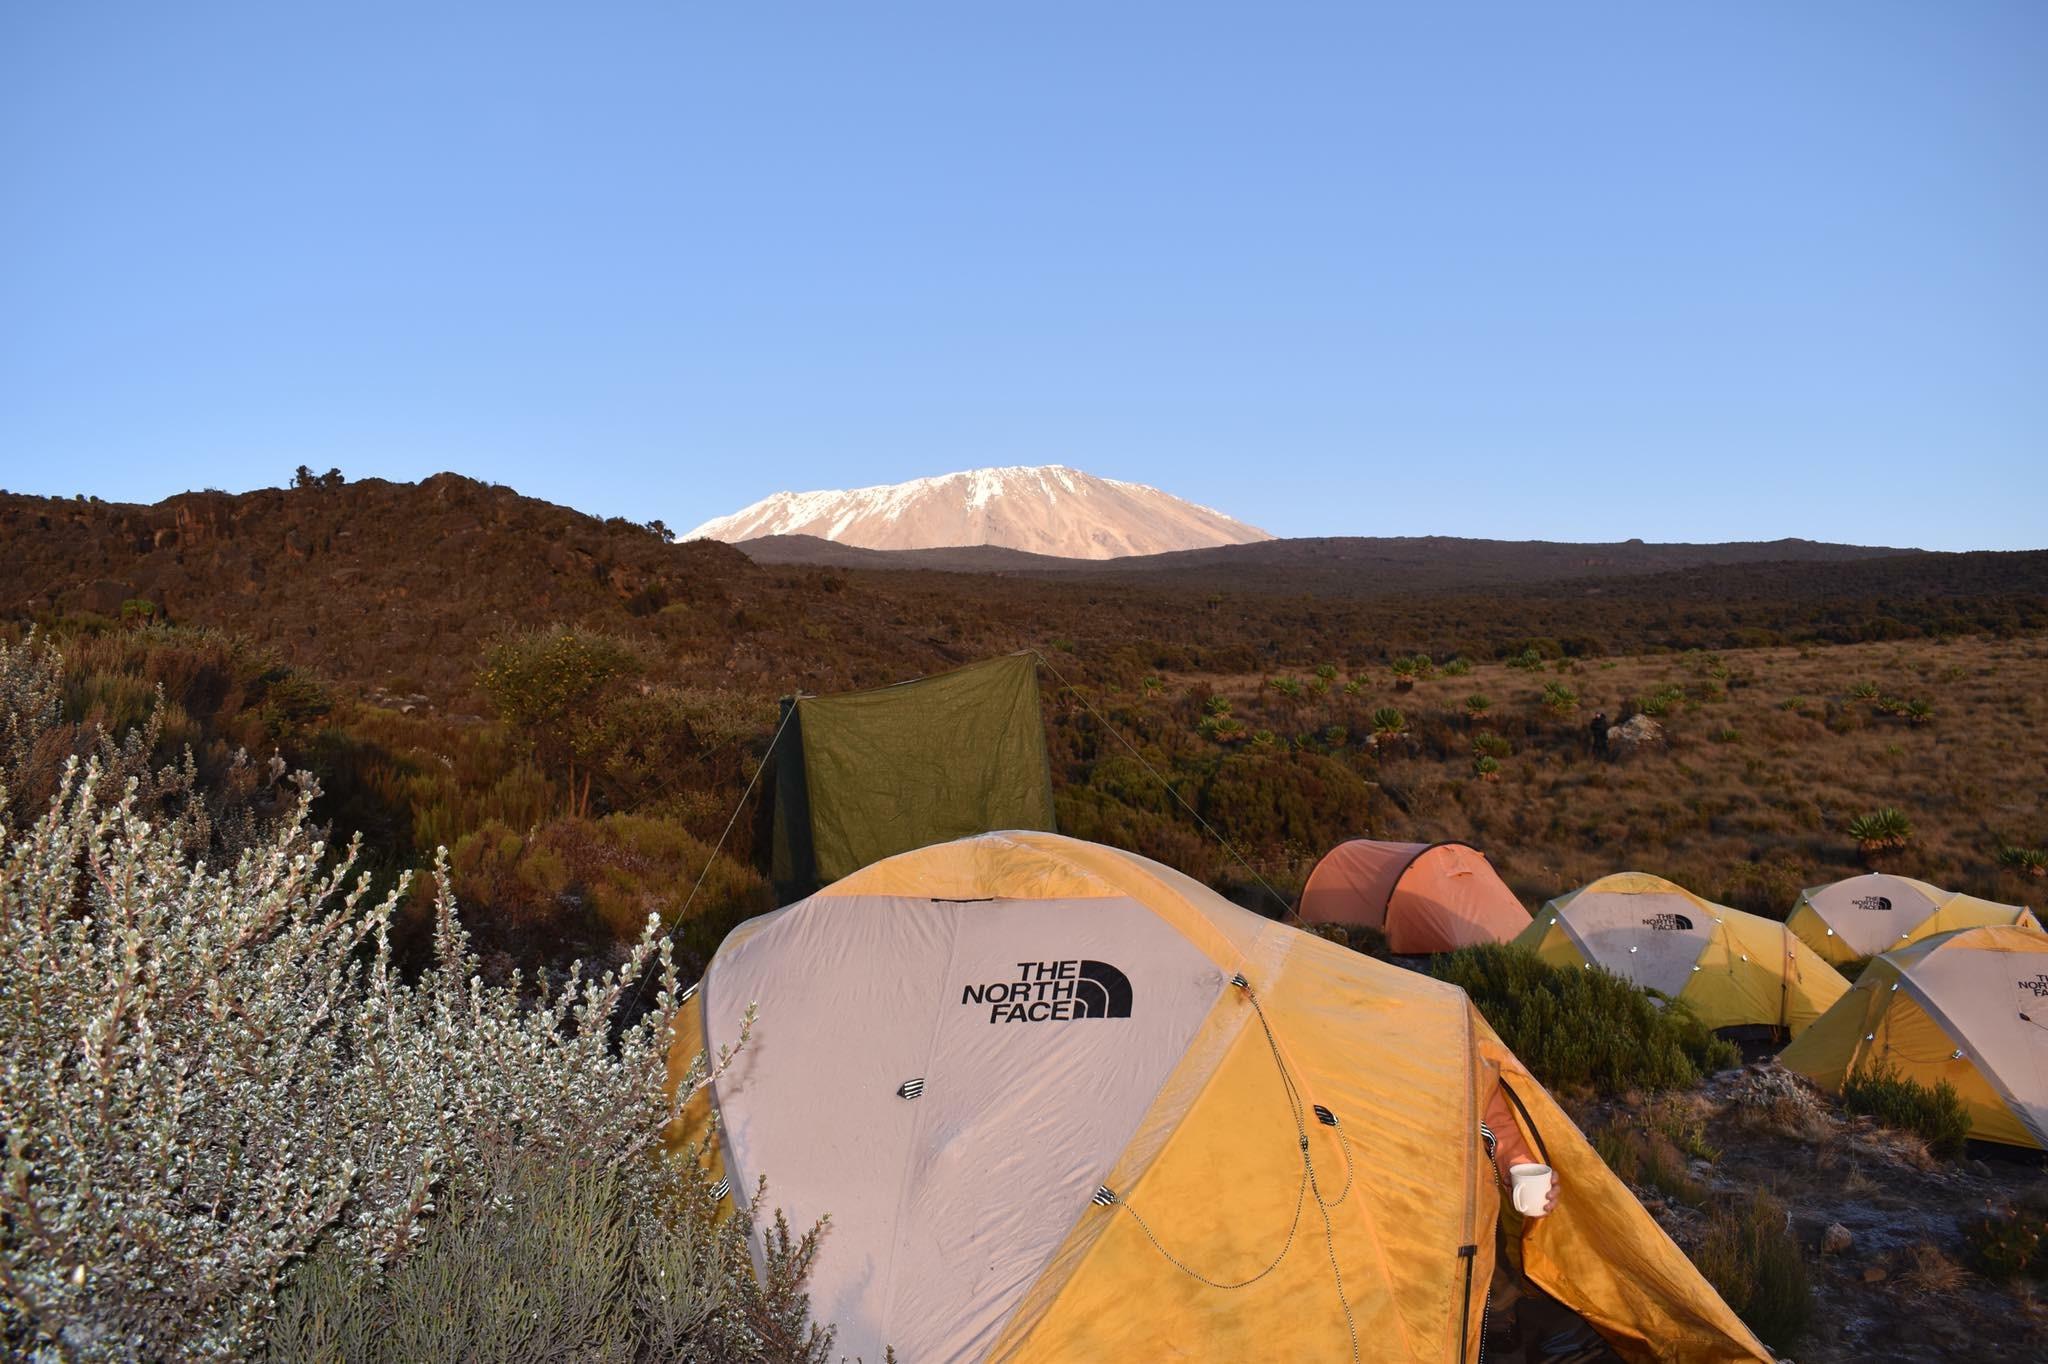 Second camp - med flott utsikt til Kilimanjaro